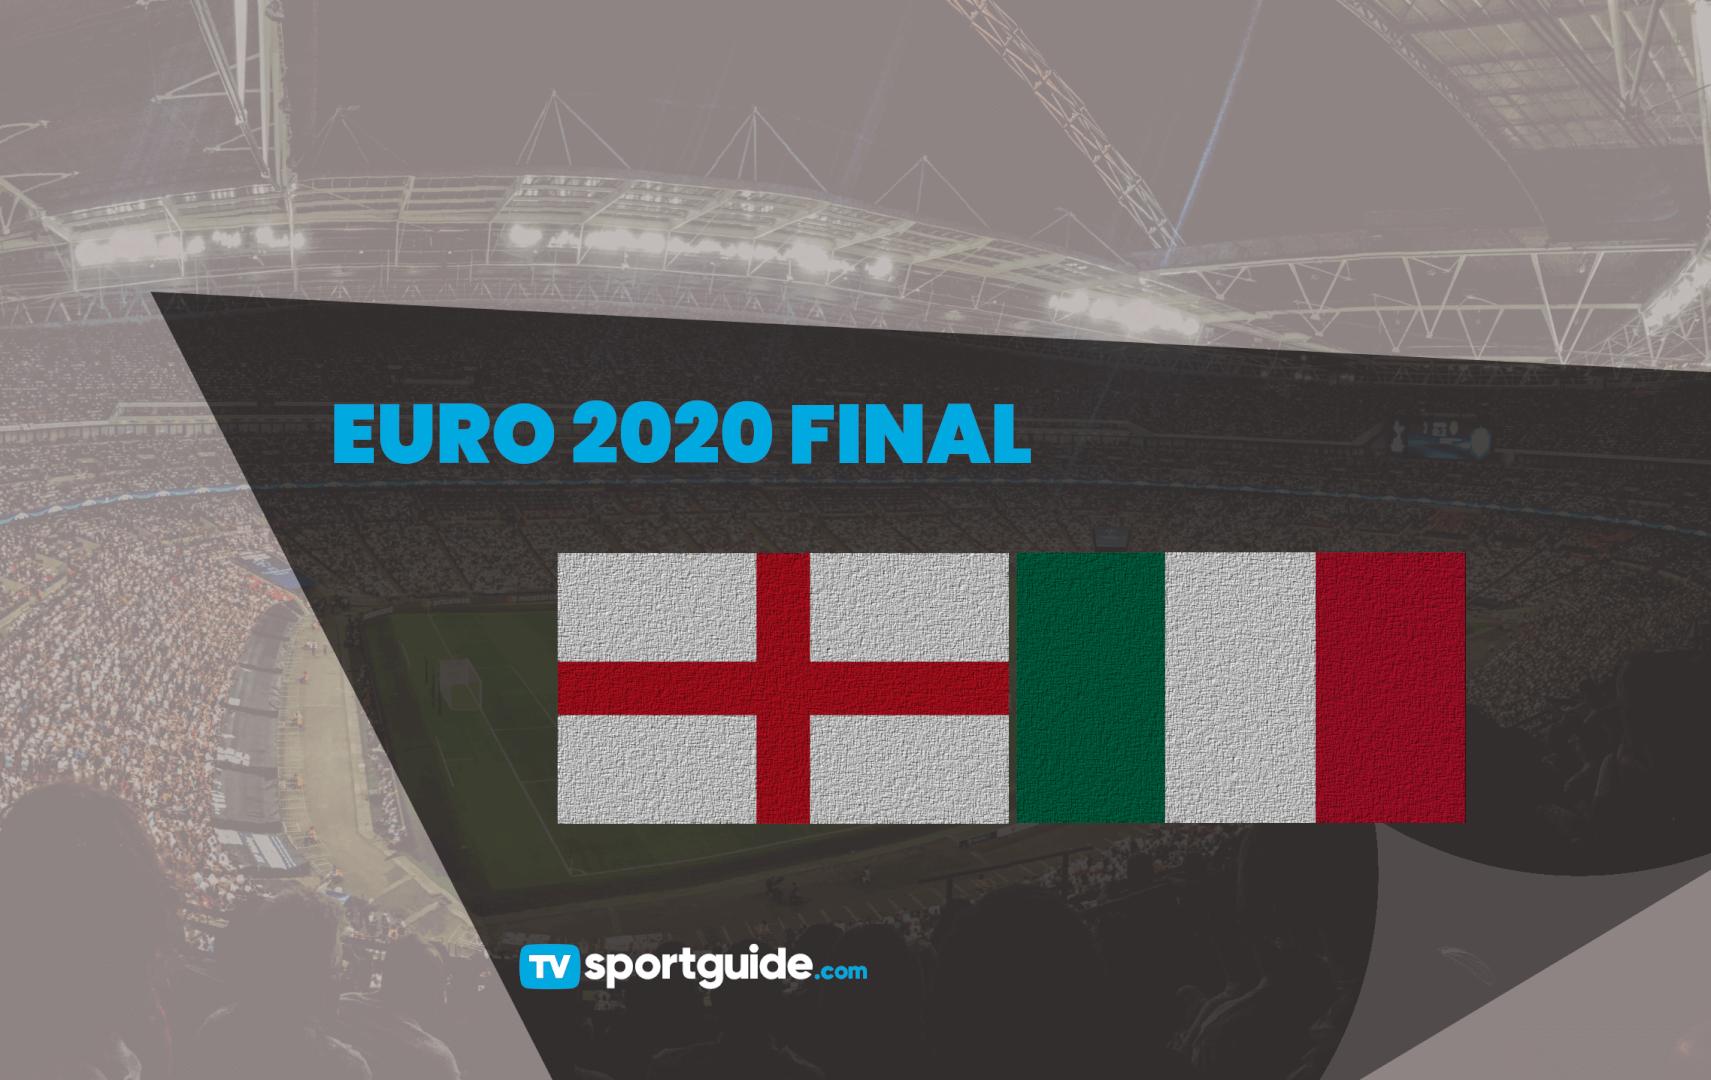 eurofinale